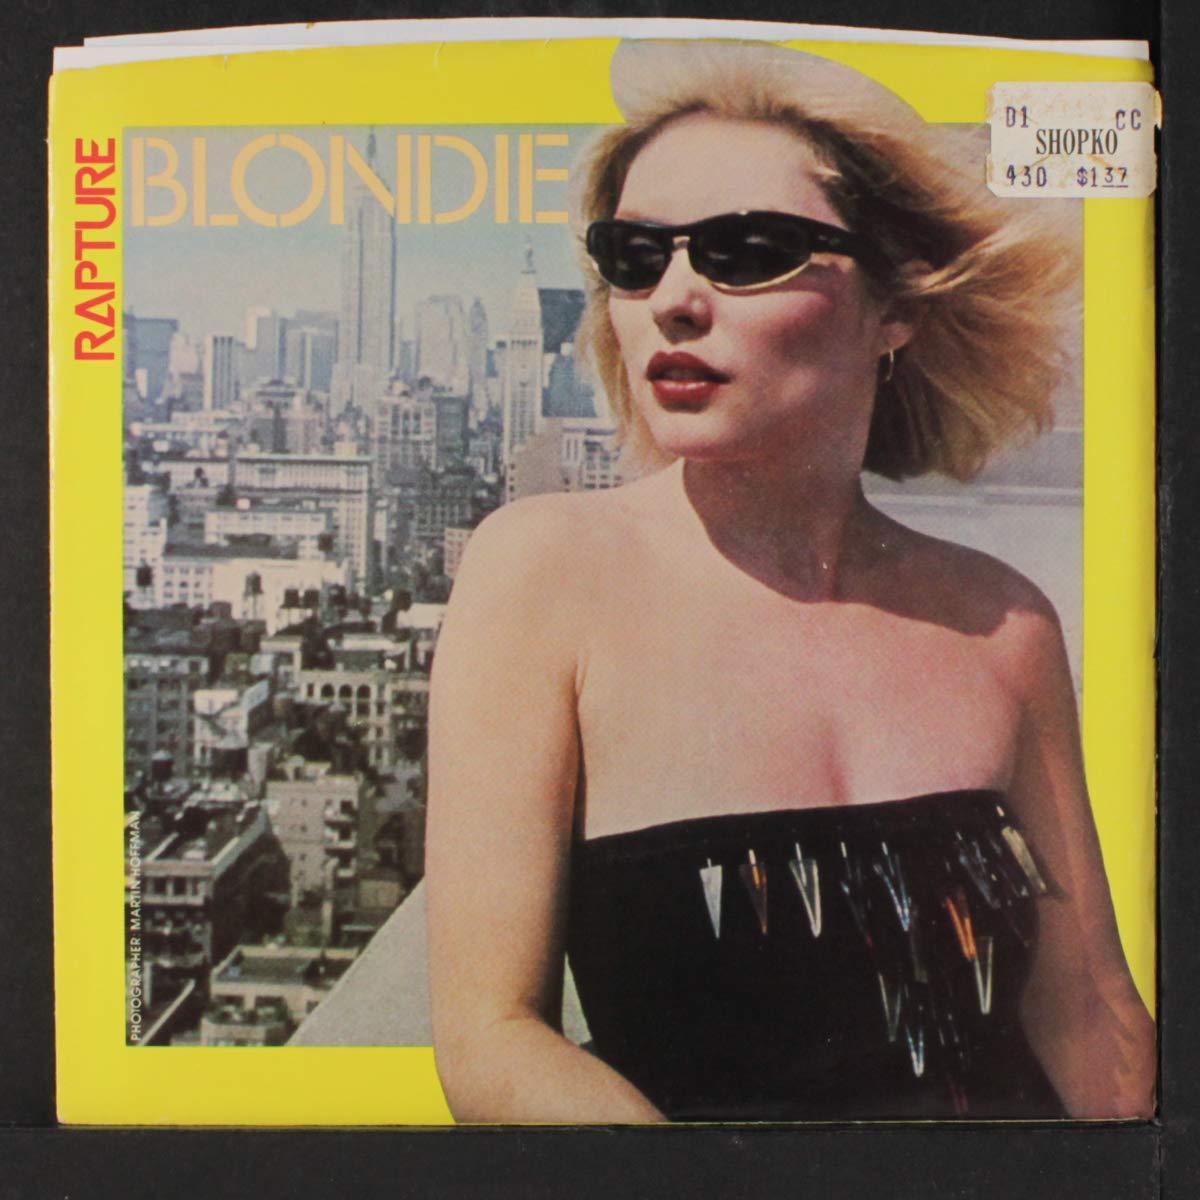 BLONDIE - rapture / walk like me 45 rpm single - Amazon.com Music